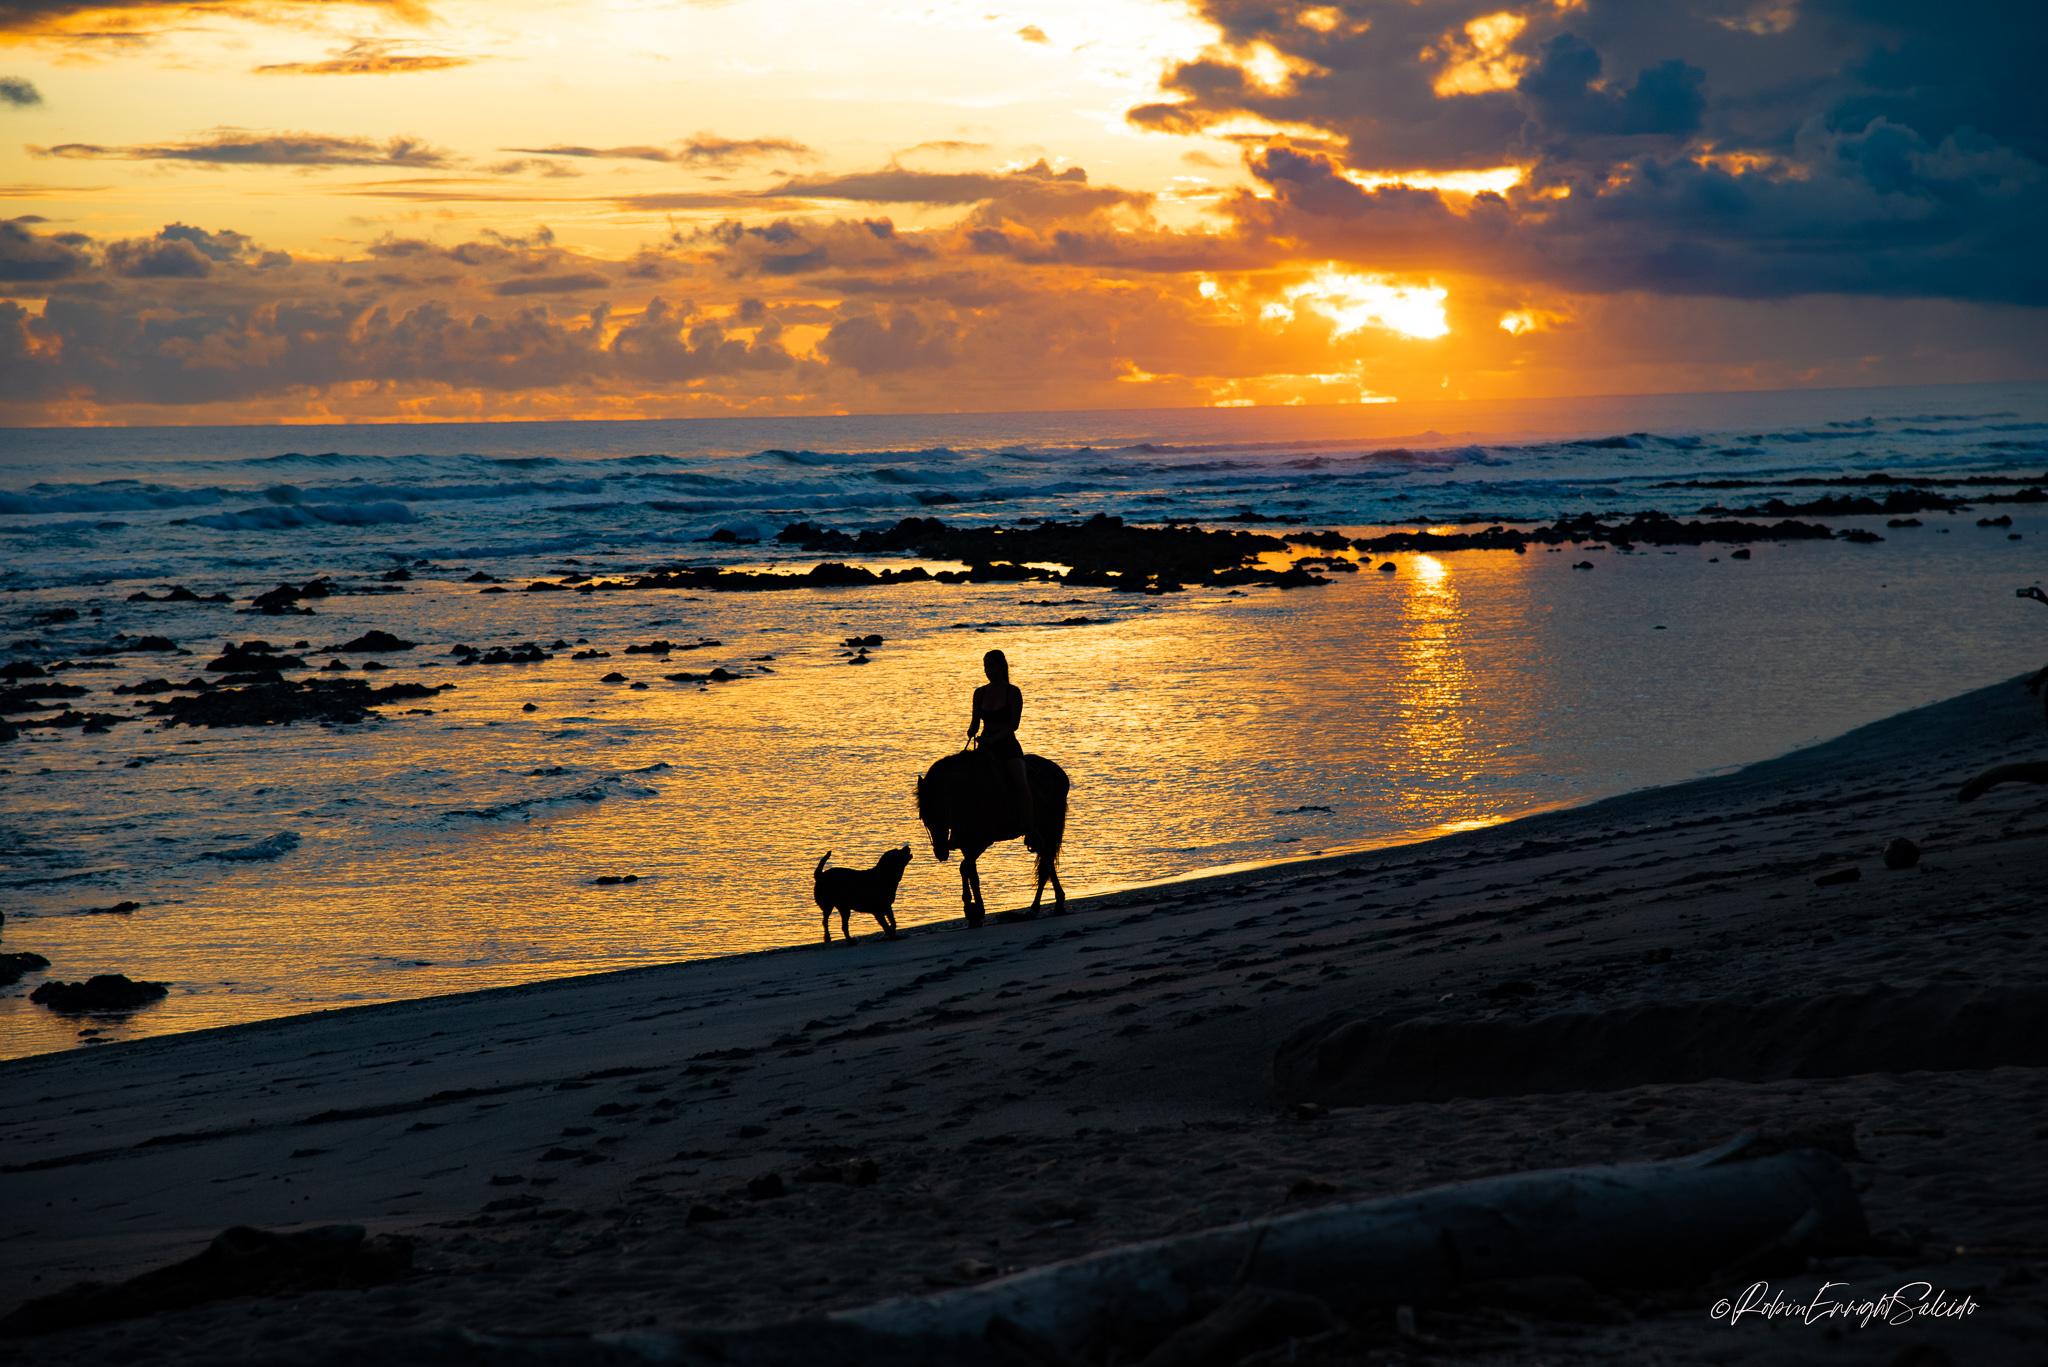 Ride-on-the-beach